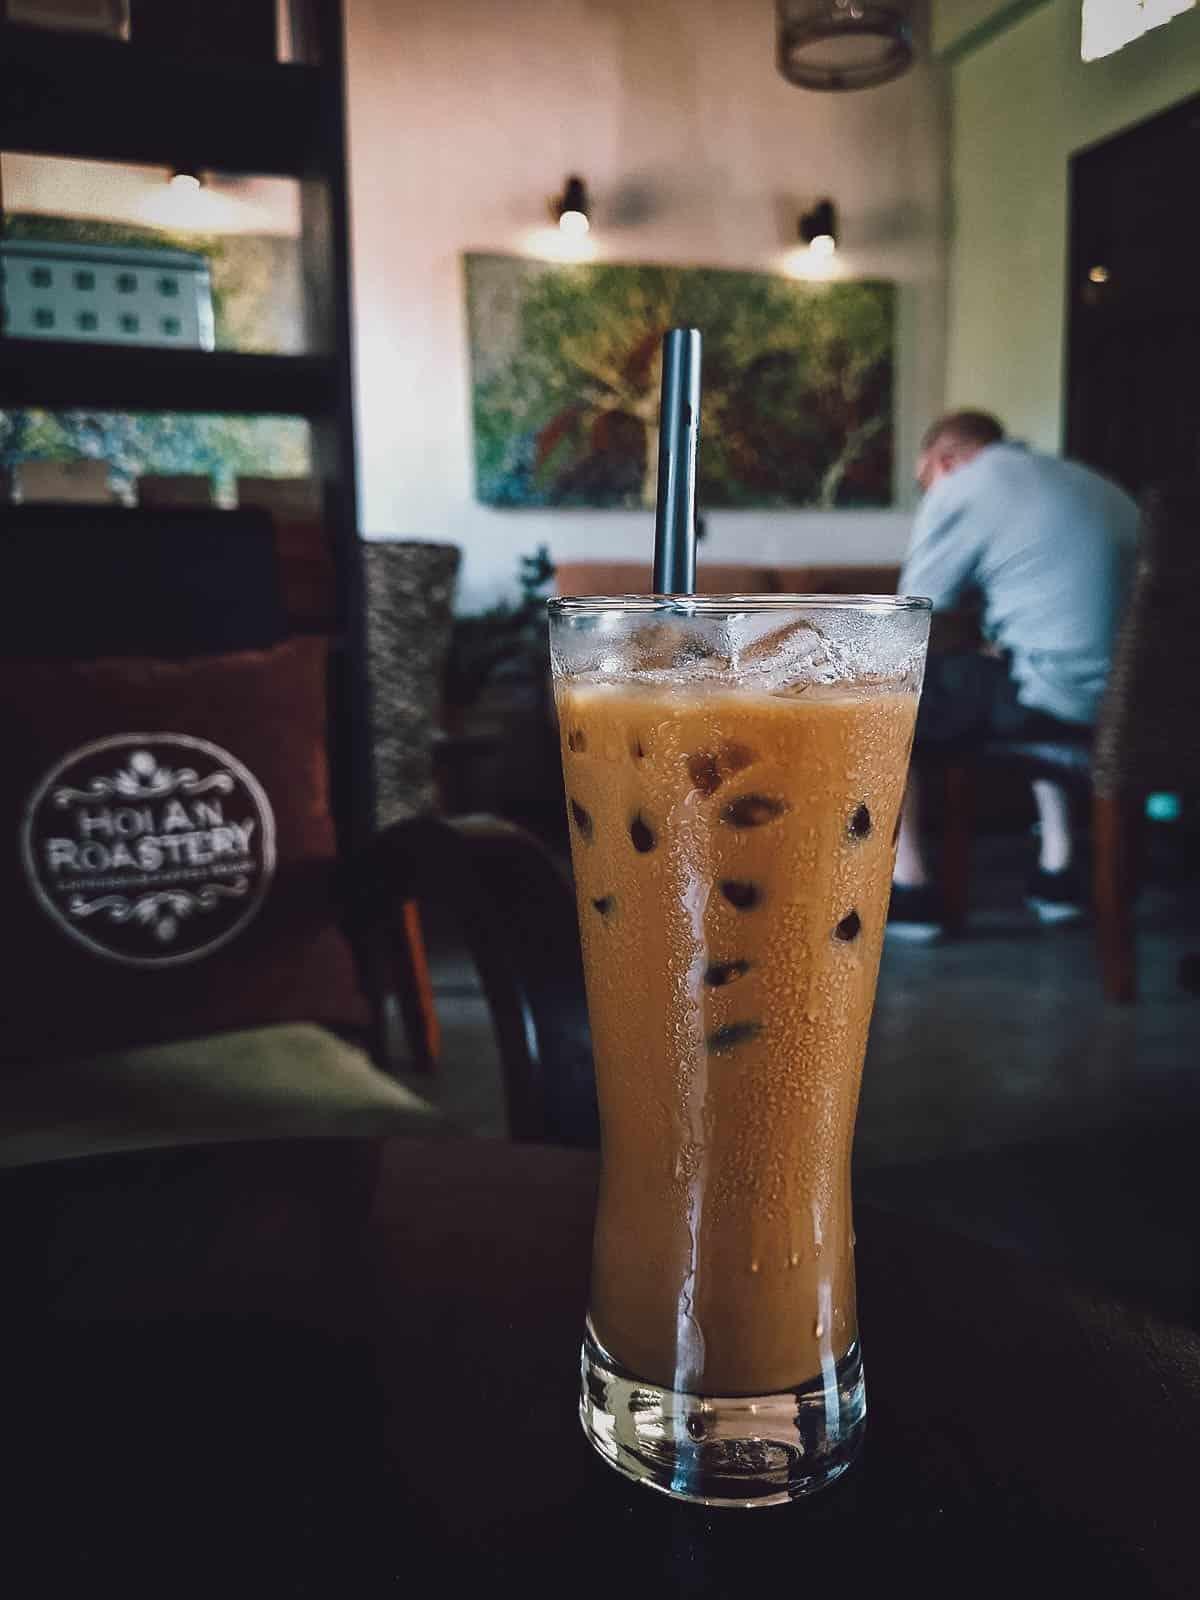 Iced coffee at Hoi An Roastery in Hoi An, Vietnam